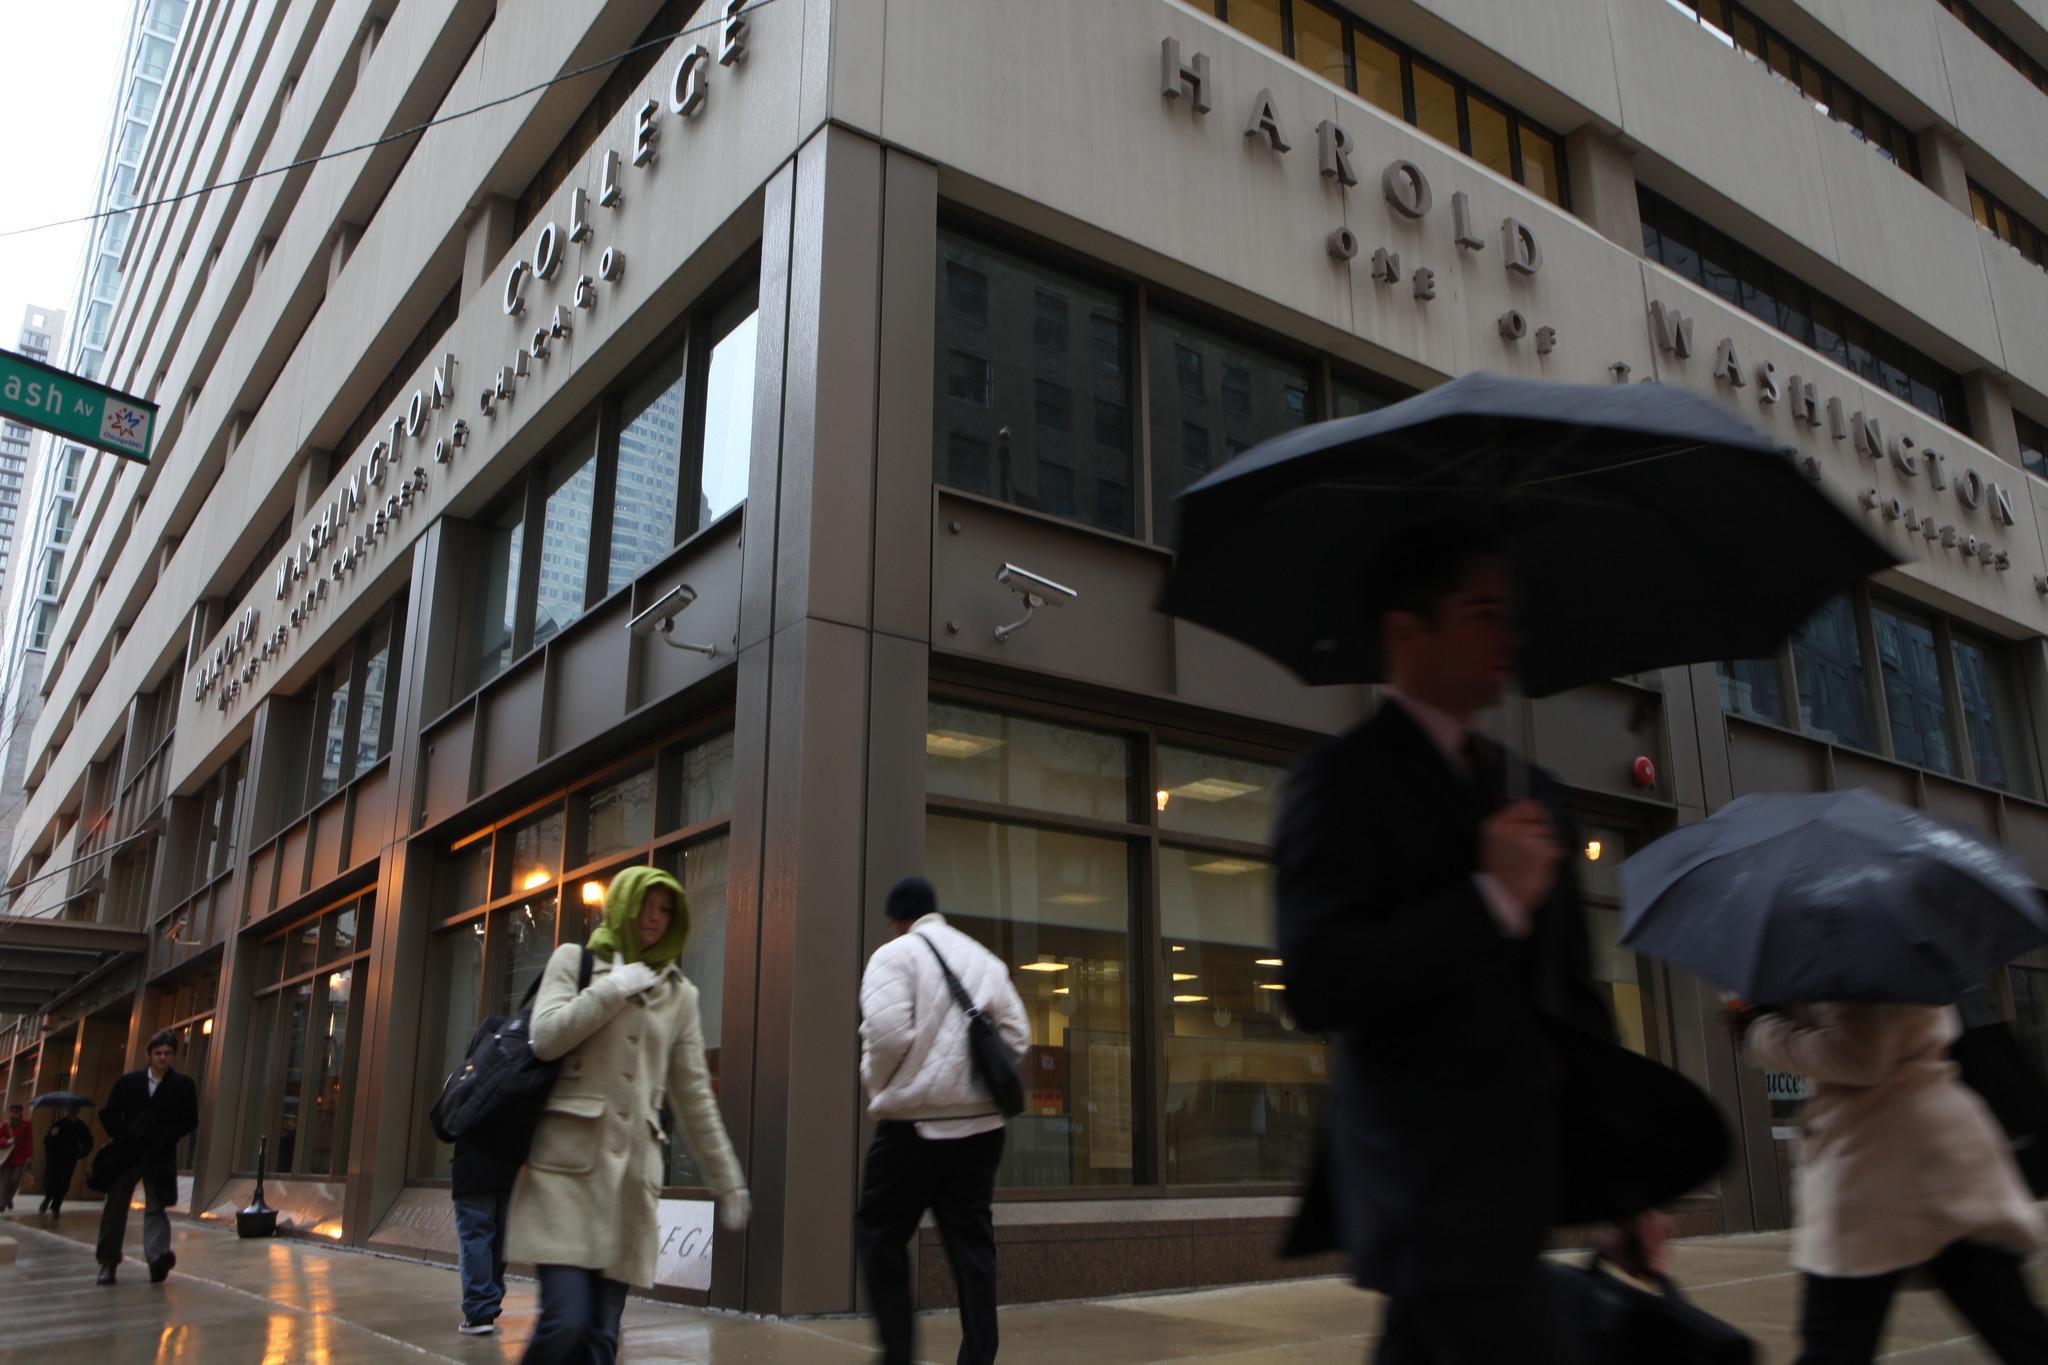 EEOC: Harold Washington College Passed Over Job Applicant